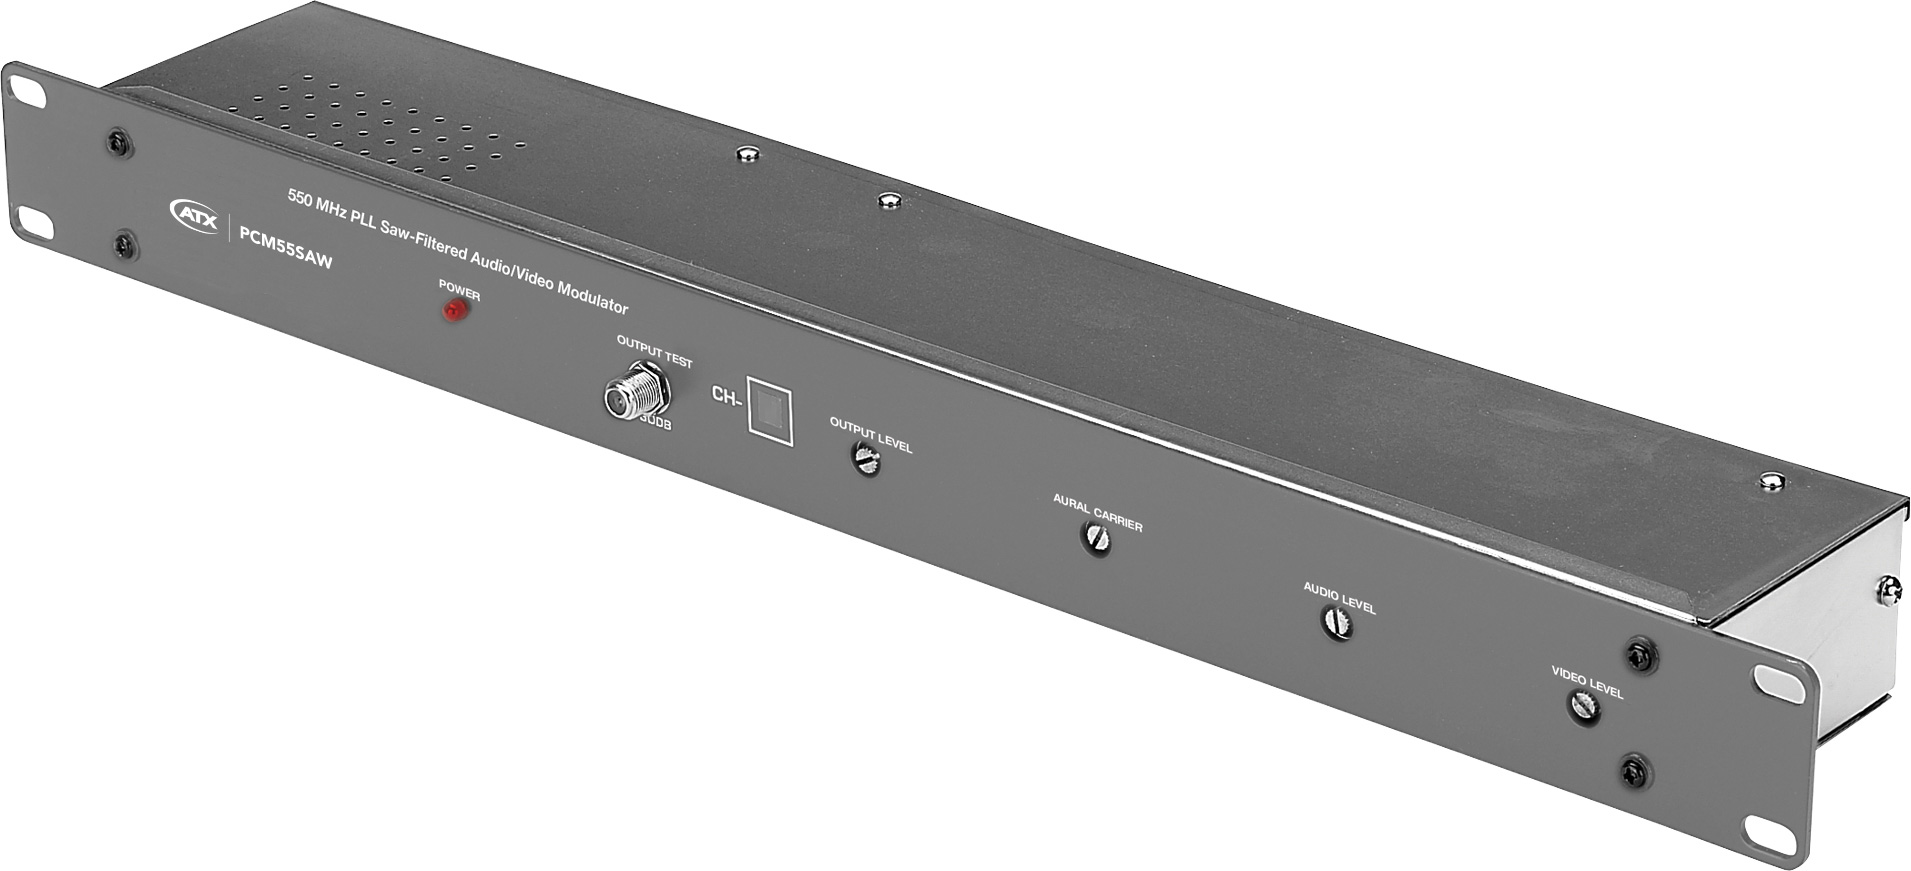 1 Channel Crystal A/V Modulator - Channel 9 PM-PCM55SAW-9